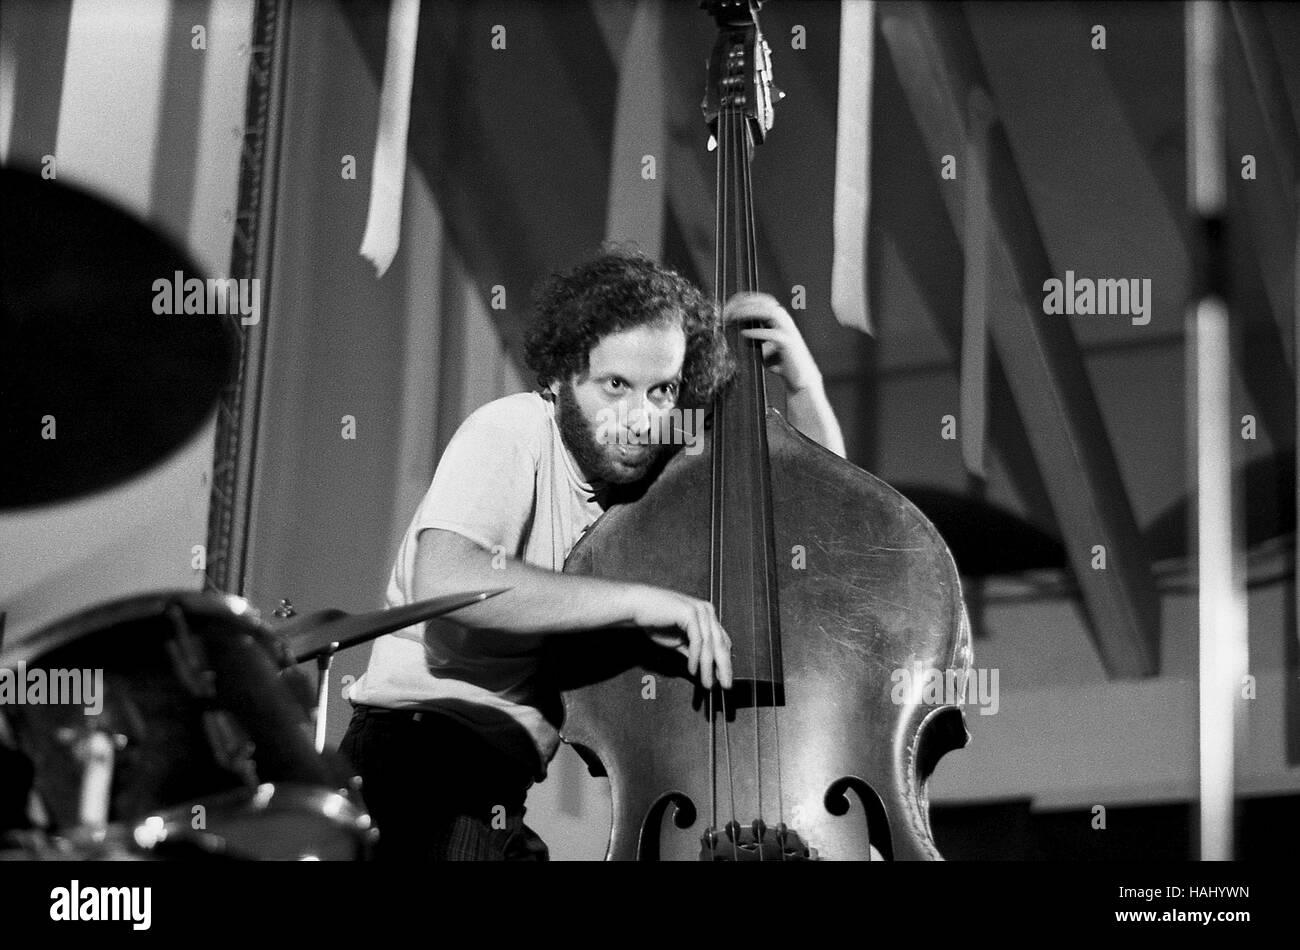 Steve Tintweiss -  10/07/1970  -  France / Alps Maritimes  -  Concert Albert Ayler, Foundation Maeght, 1970   - - Stock Image